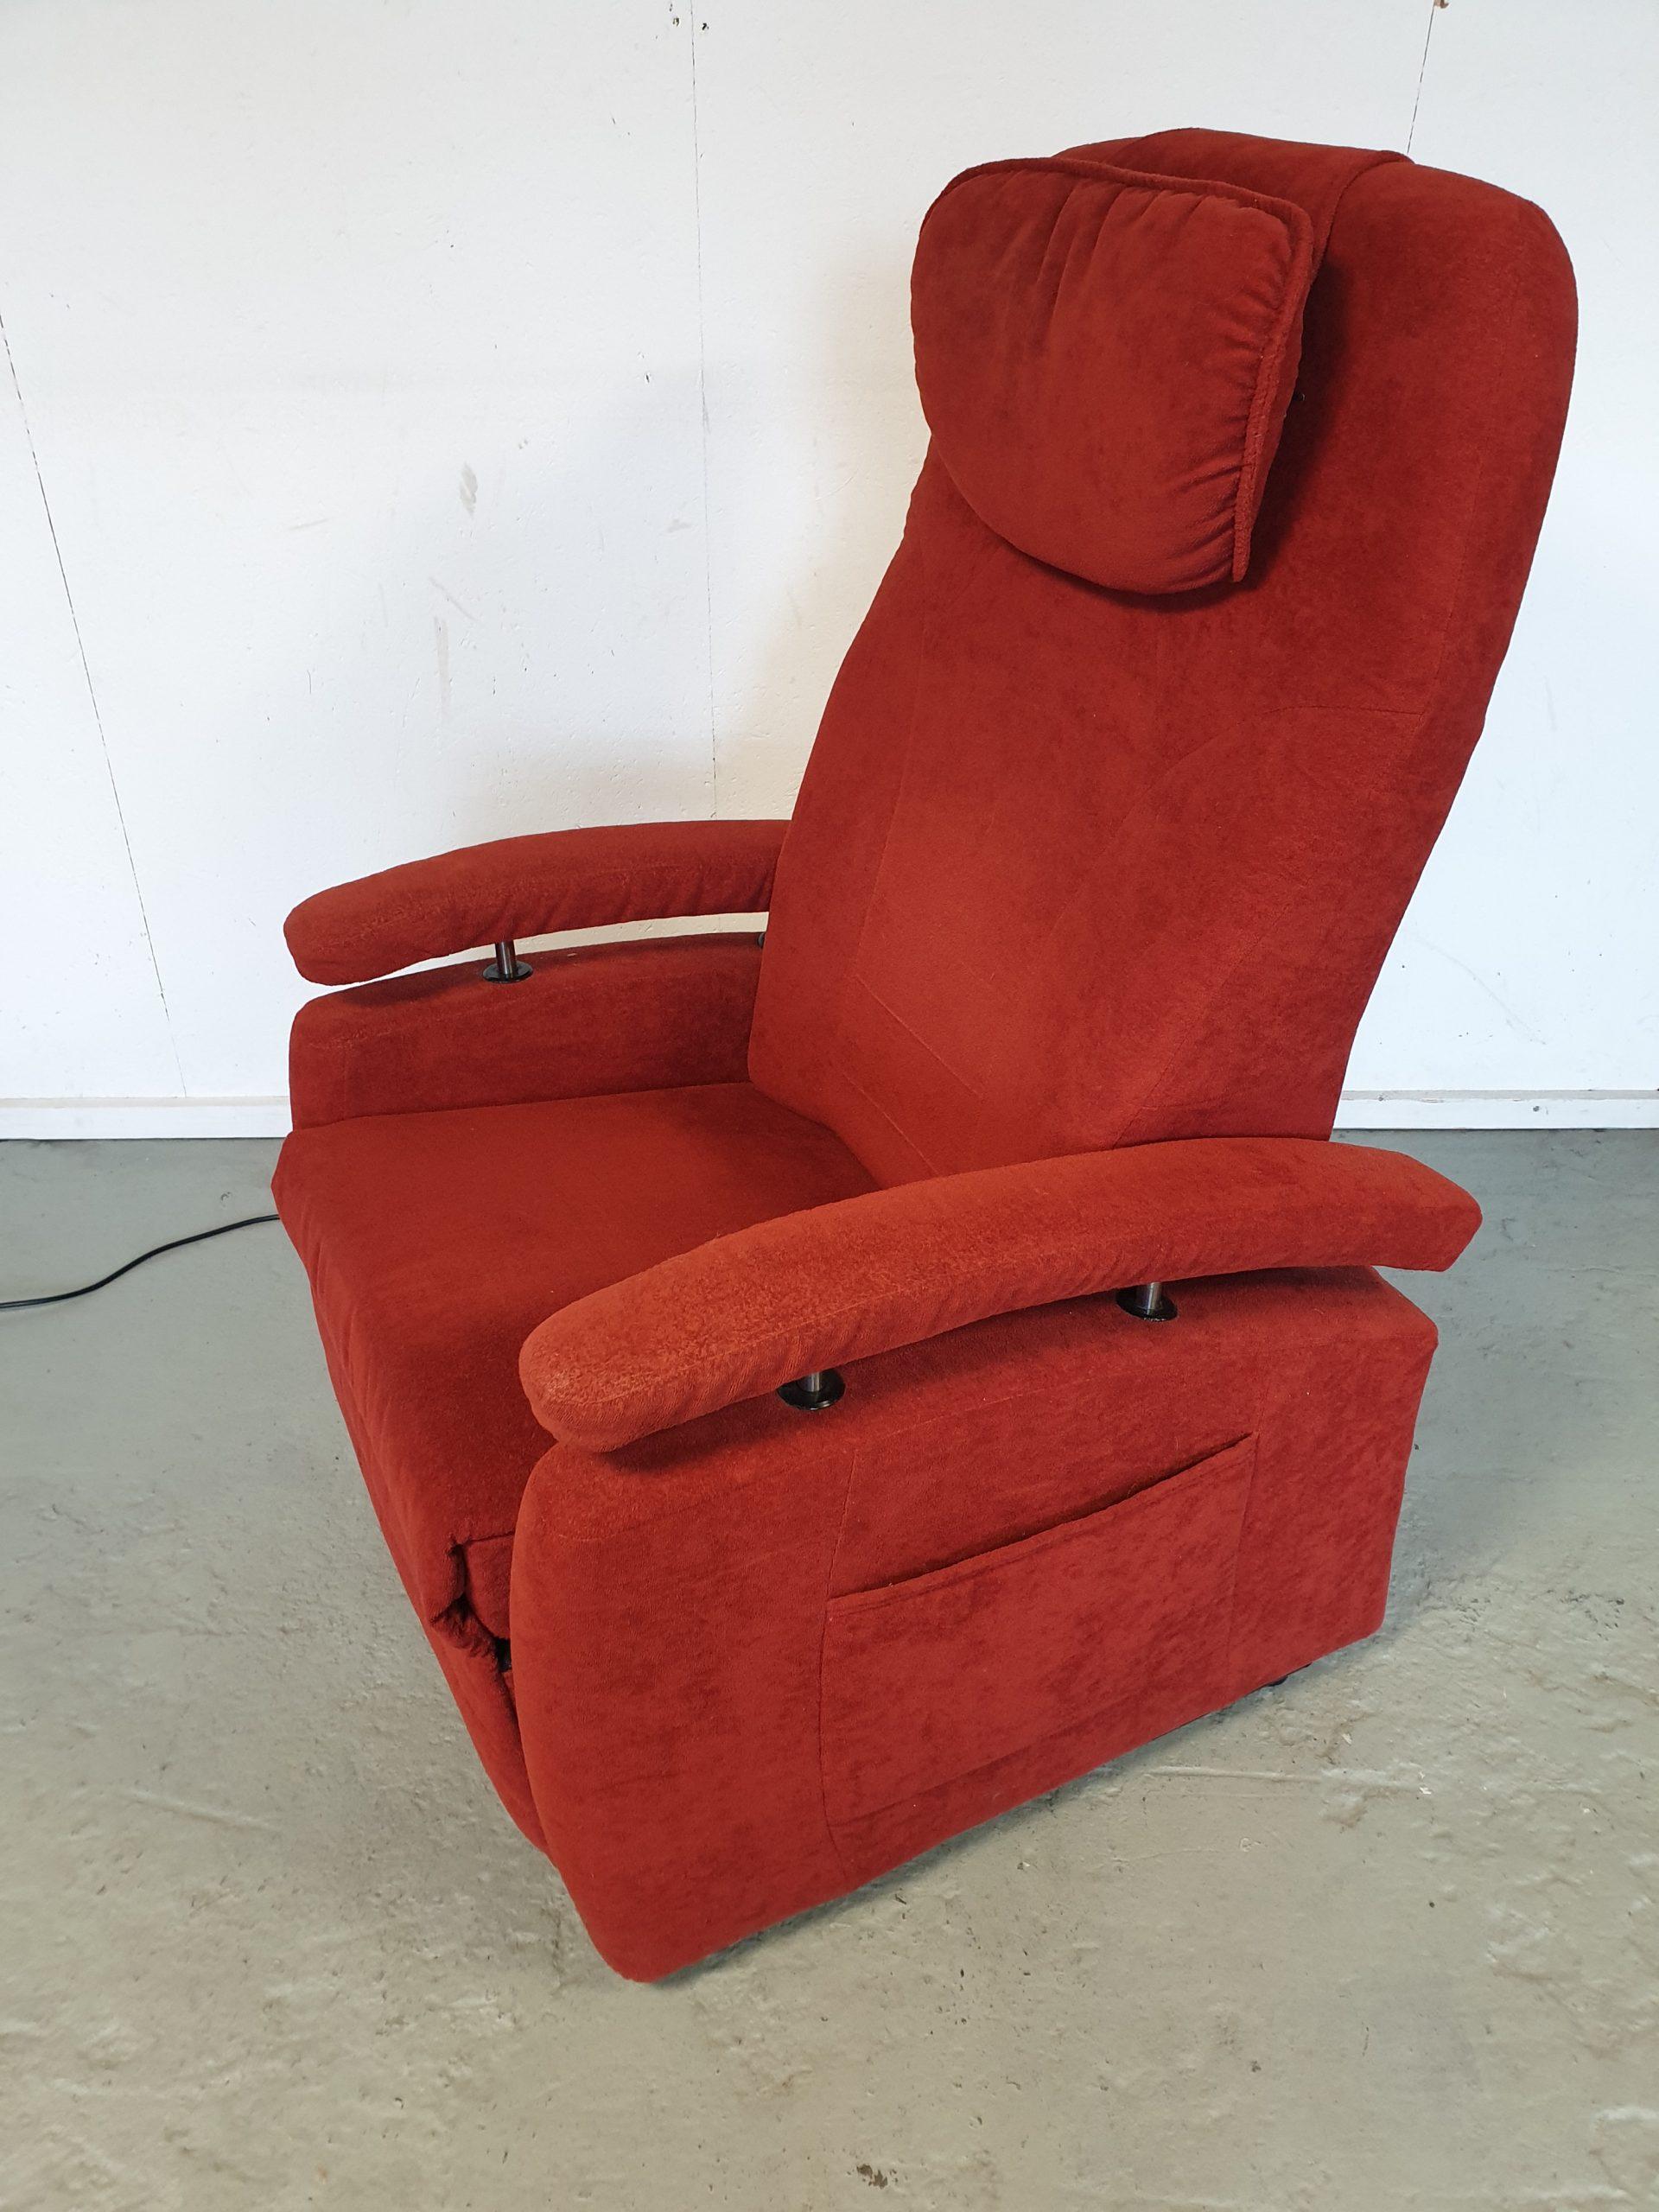 Fitform rood sta op stoel